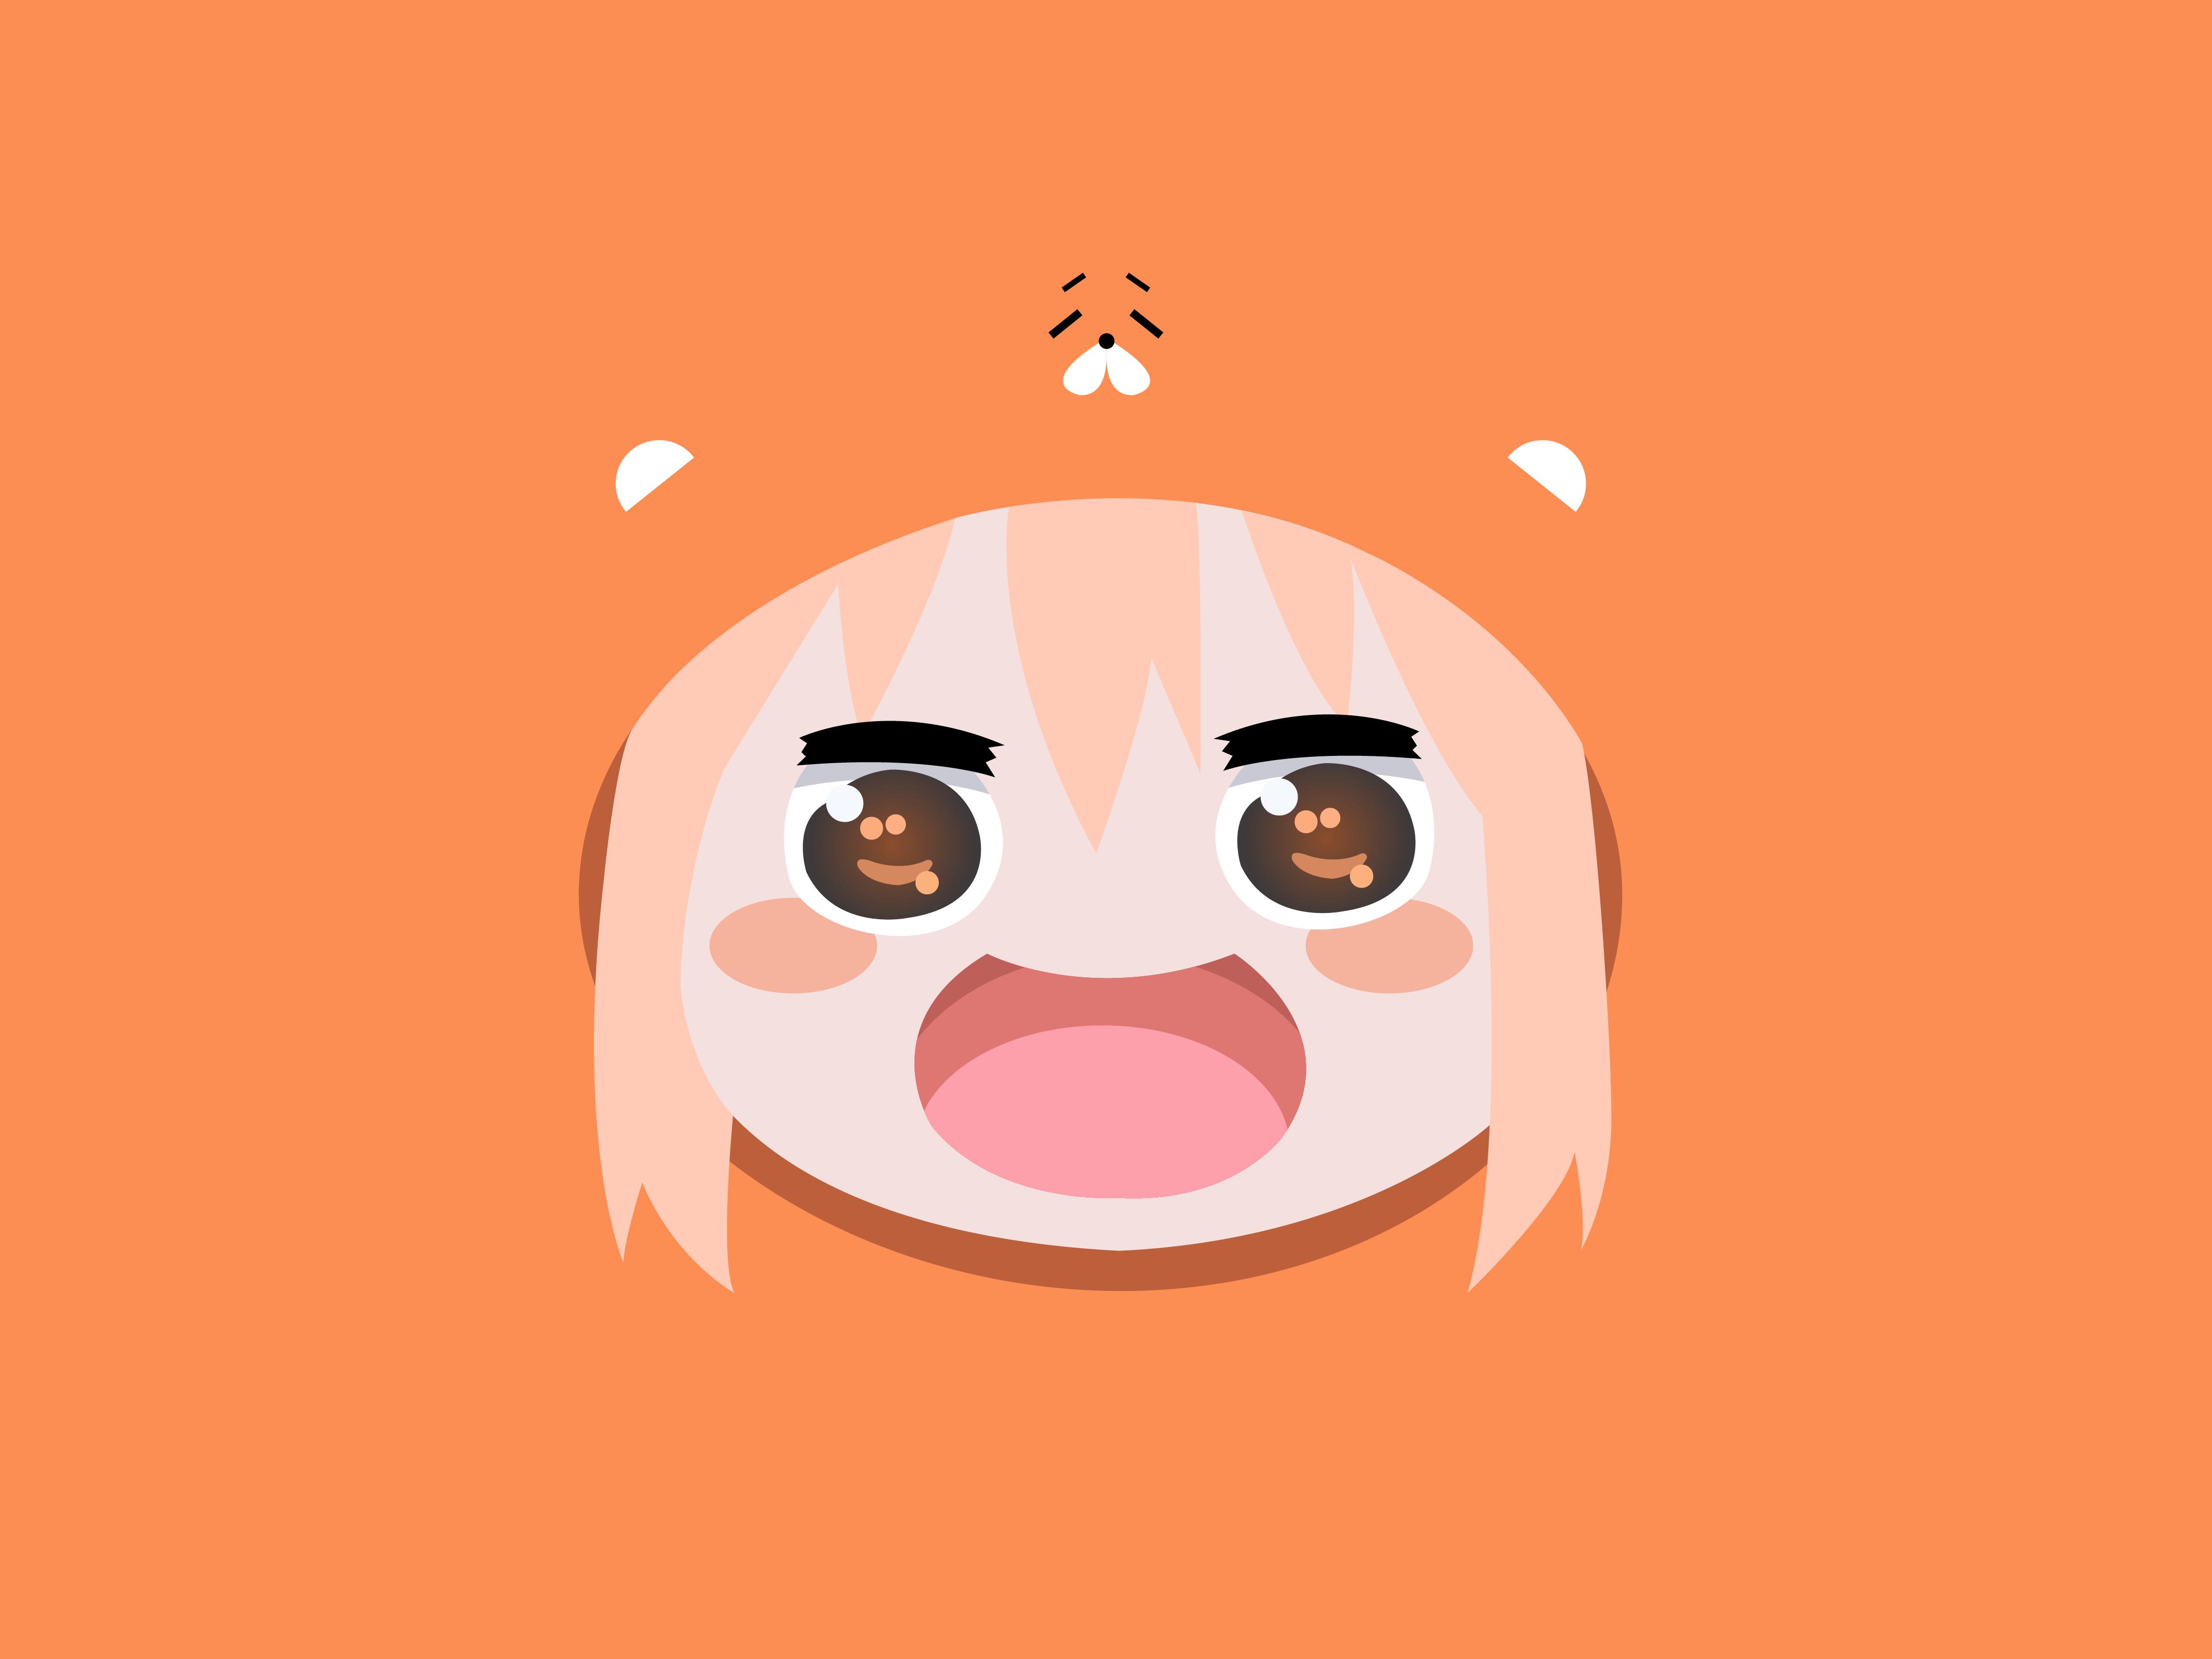 Anime 4267x3200 anime anime girls Himouto! Umaru-chan Doma Umaru minimalism simple background